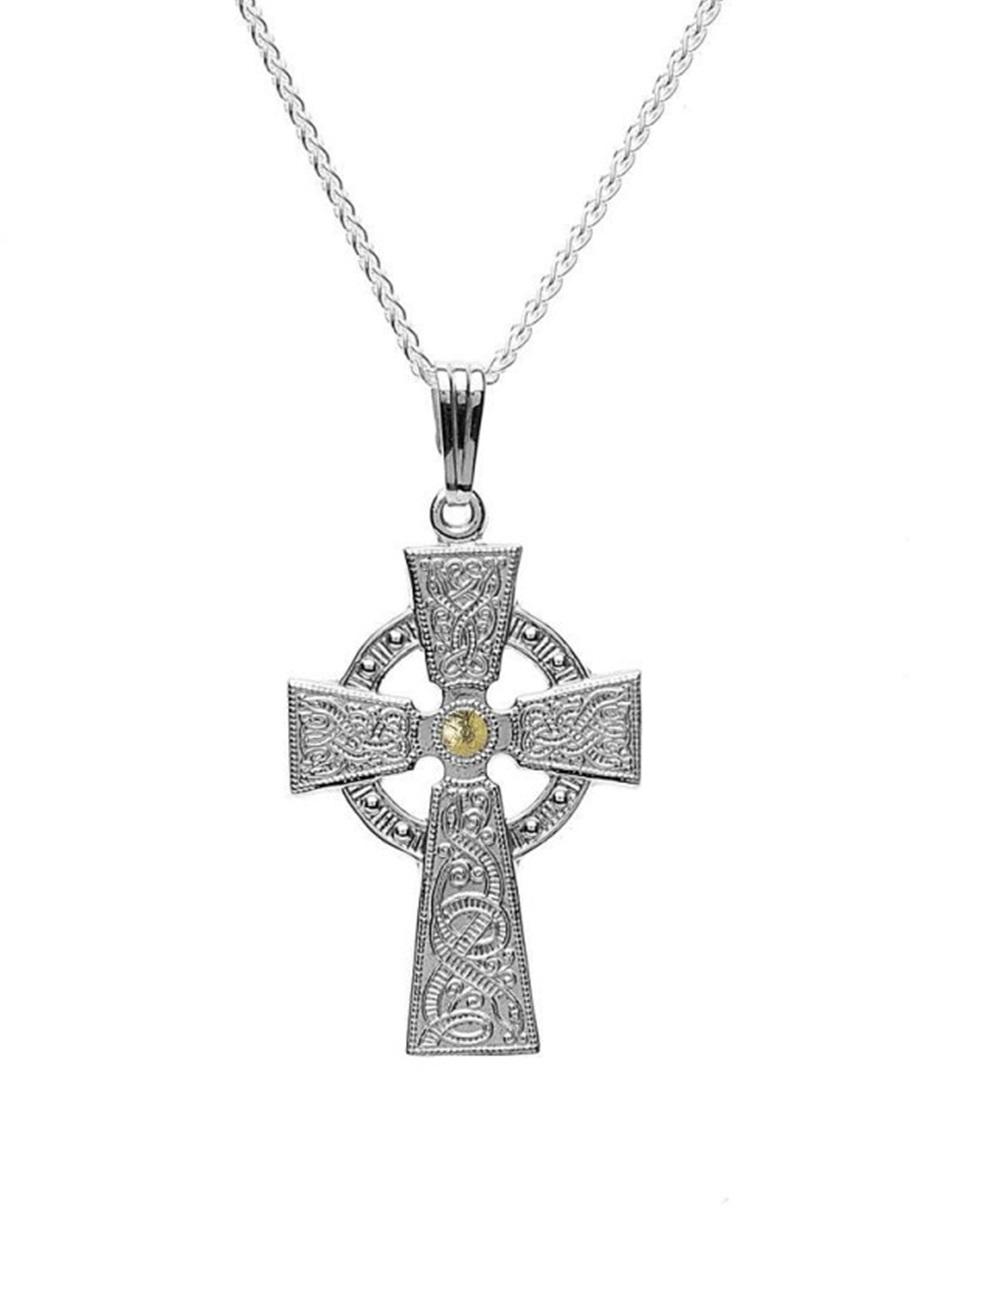 f177f975c1a9a New Celtic Warrior Cross Silver   18K Gold Plate Irish Made Boru ...